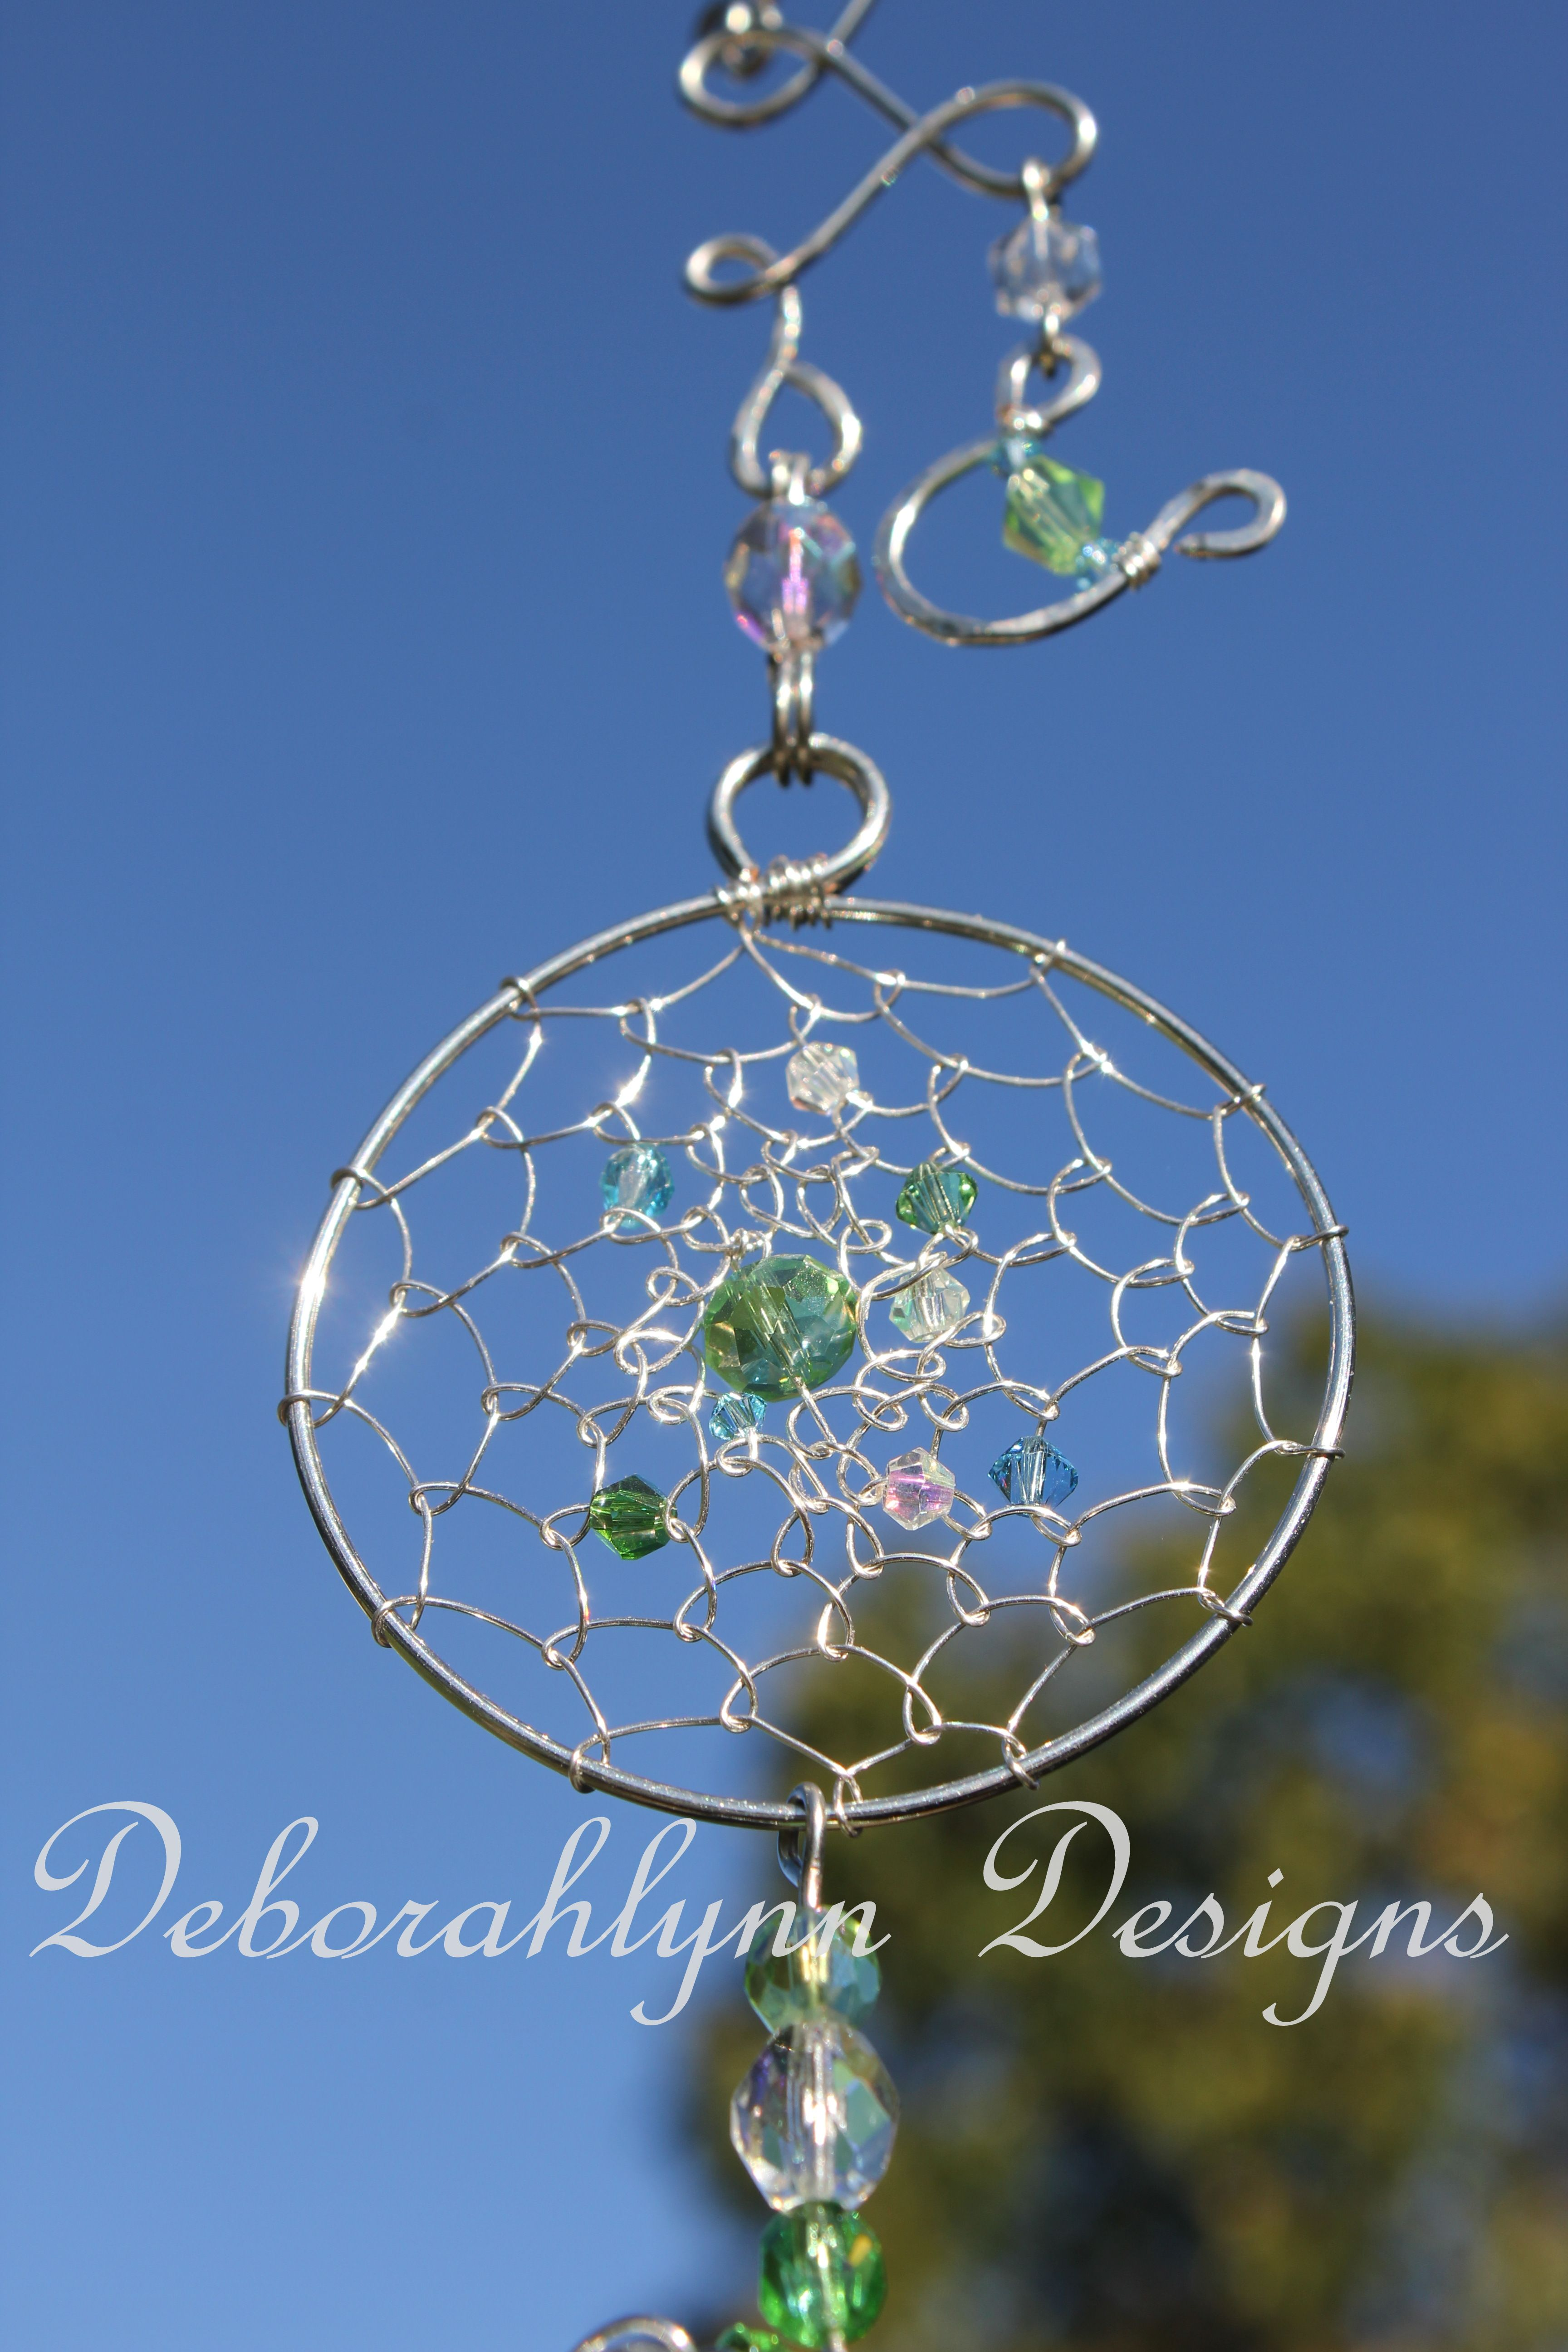 Exquisite Deborahlynn Designs \'Follow Your Equus Dreams ...